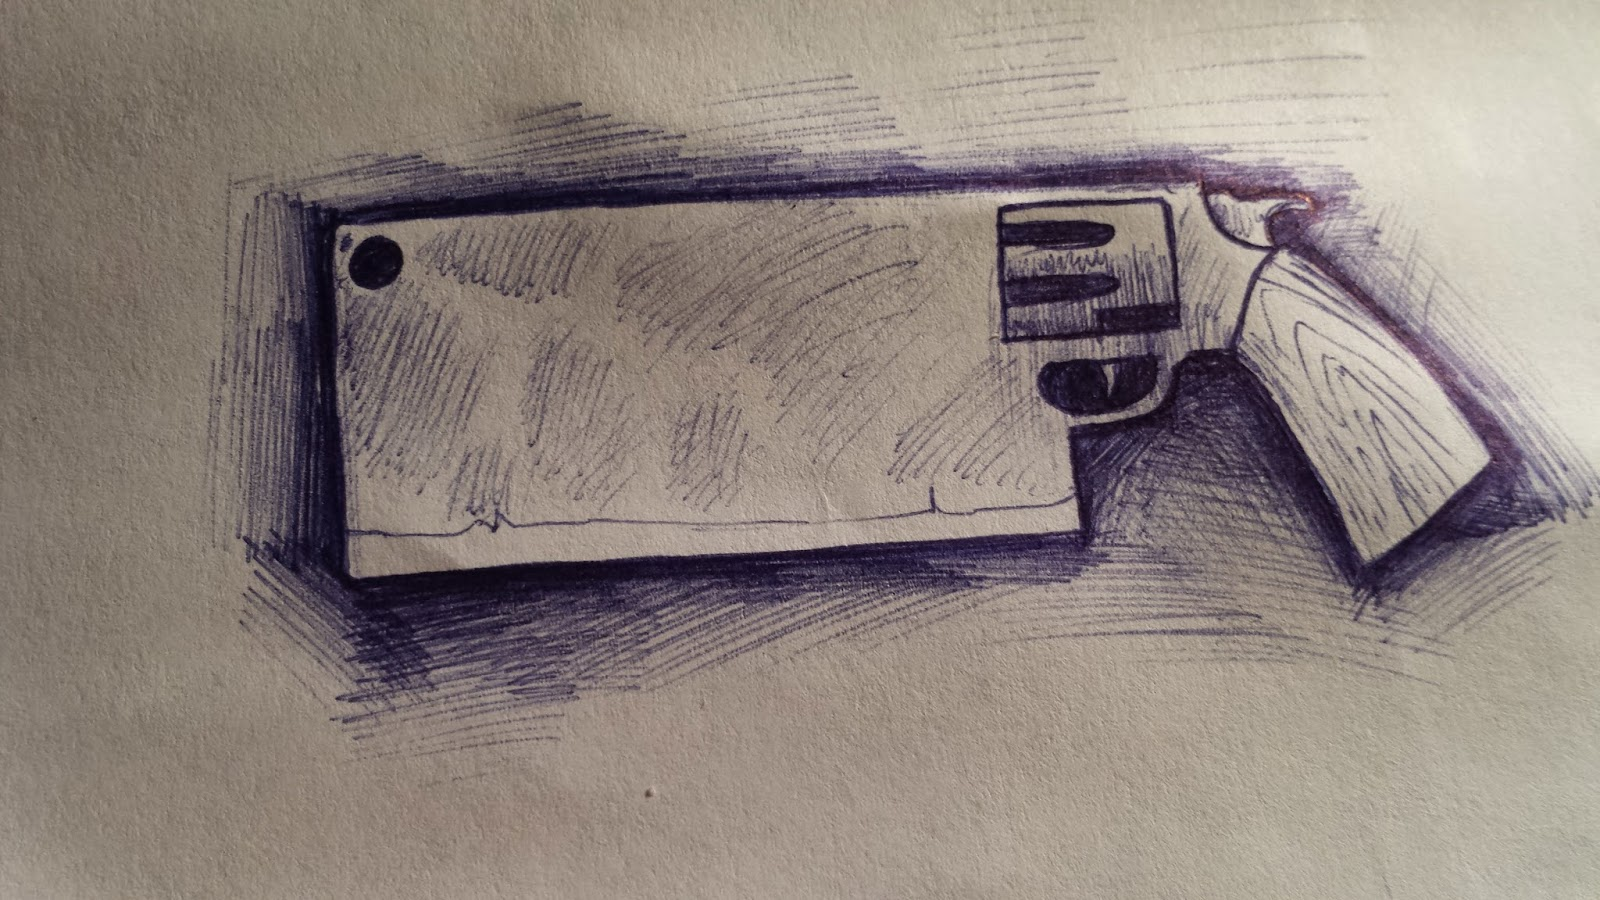 Gunblade Drawings and Designs 2